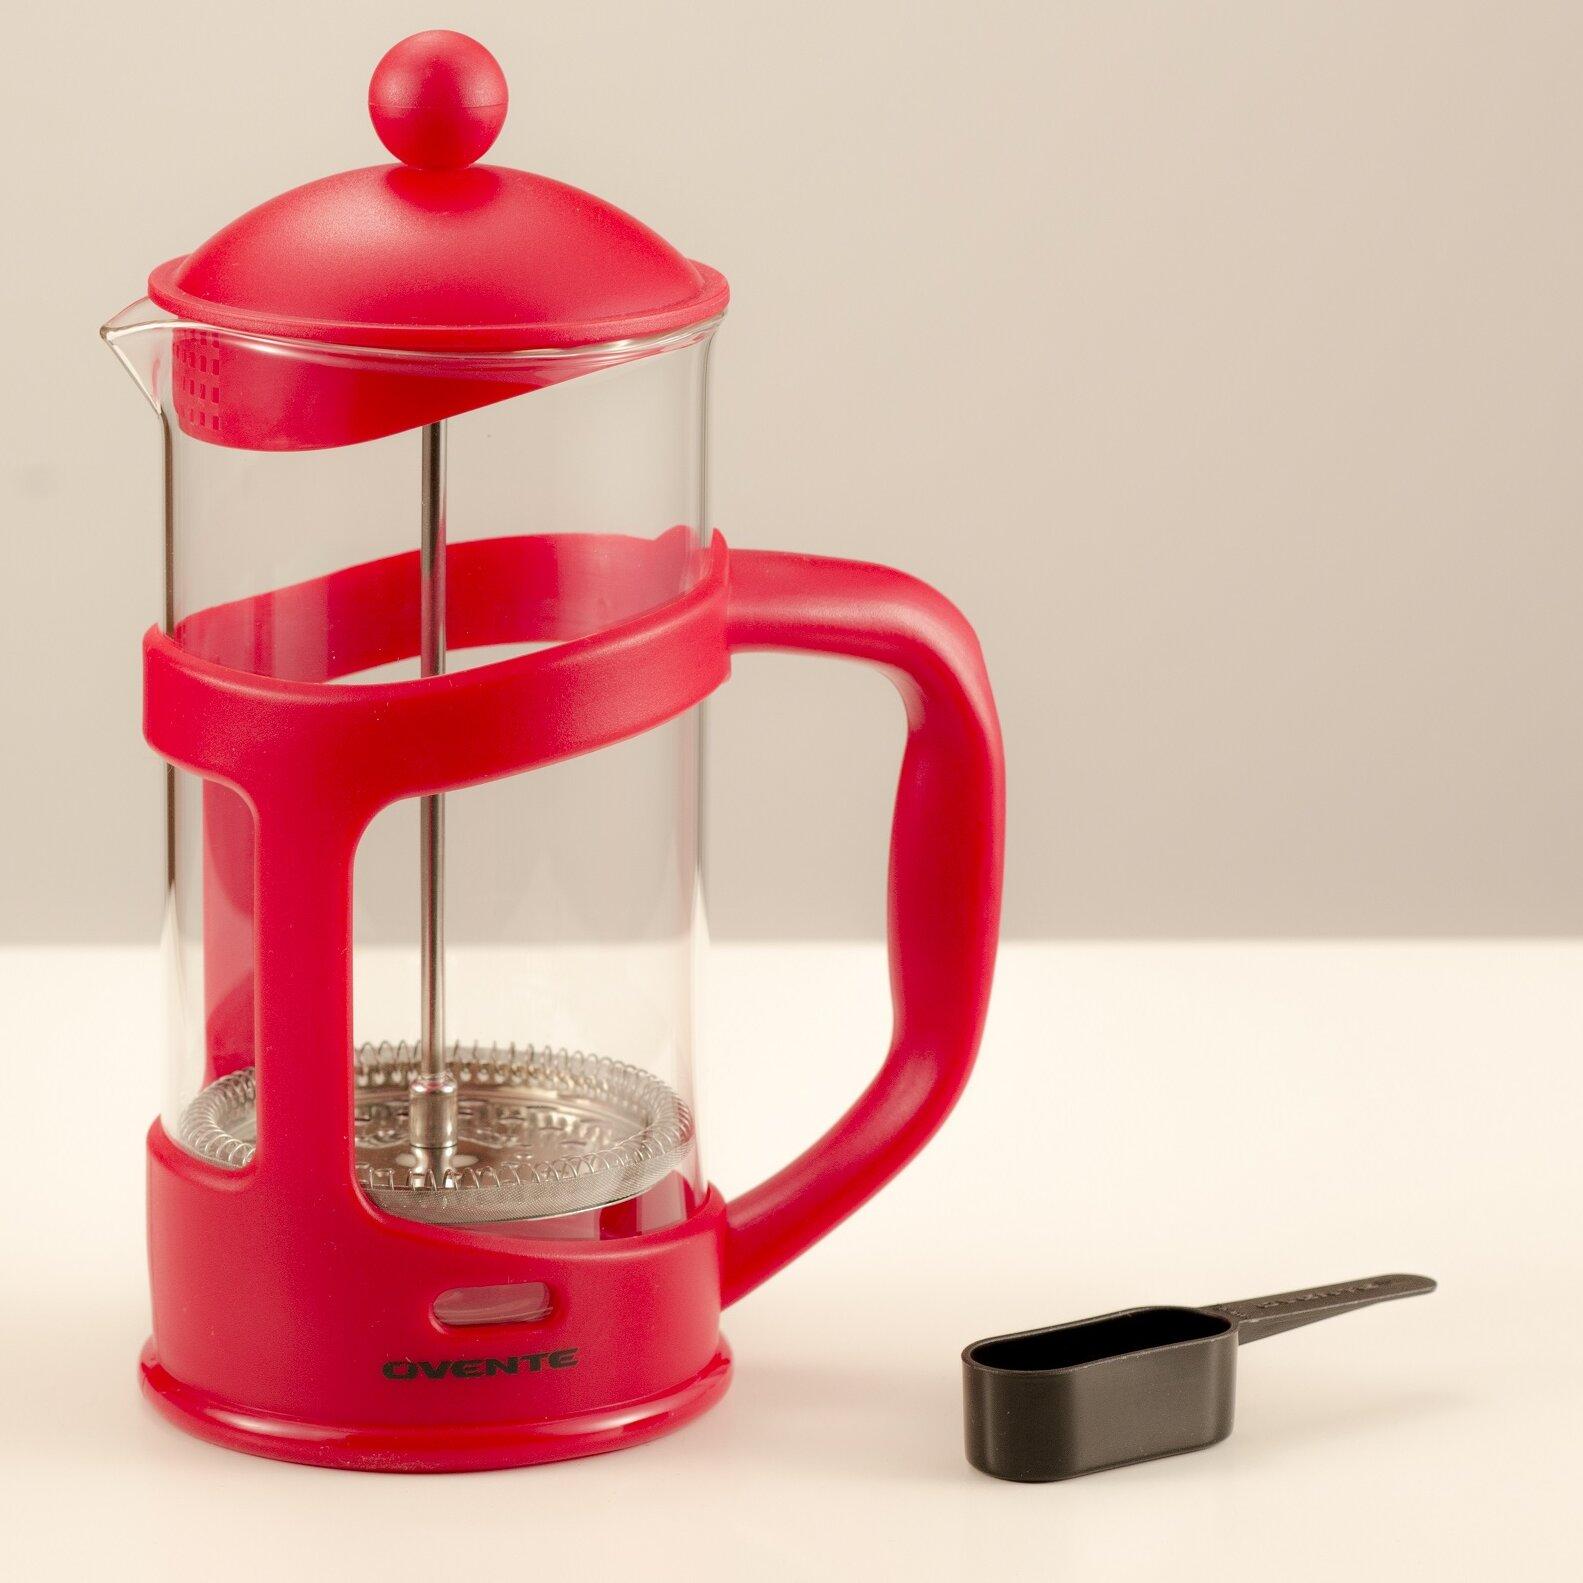 Ovente 34 Oz. French Press Coffee Maker eBay